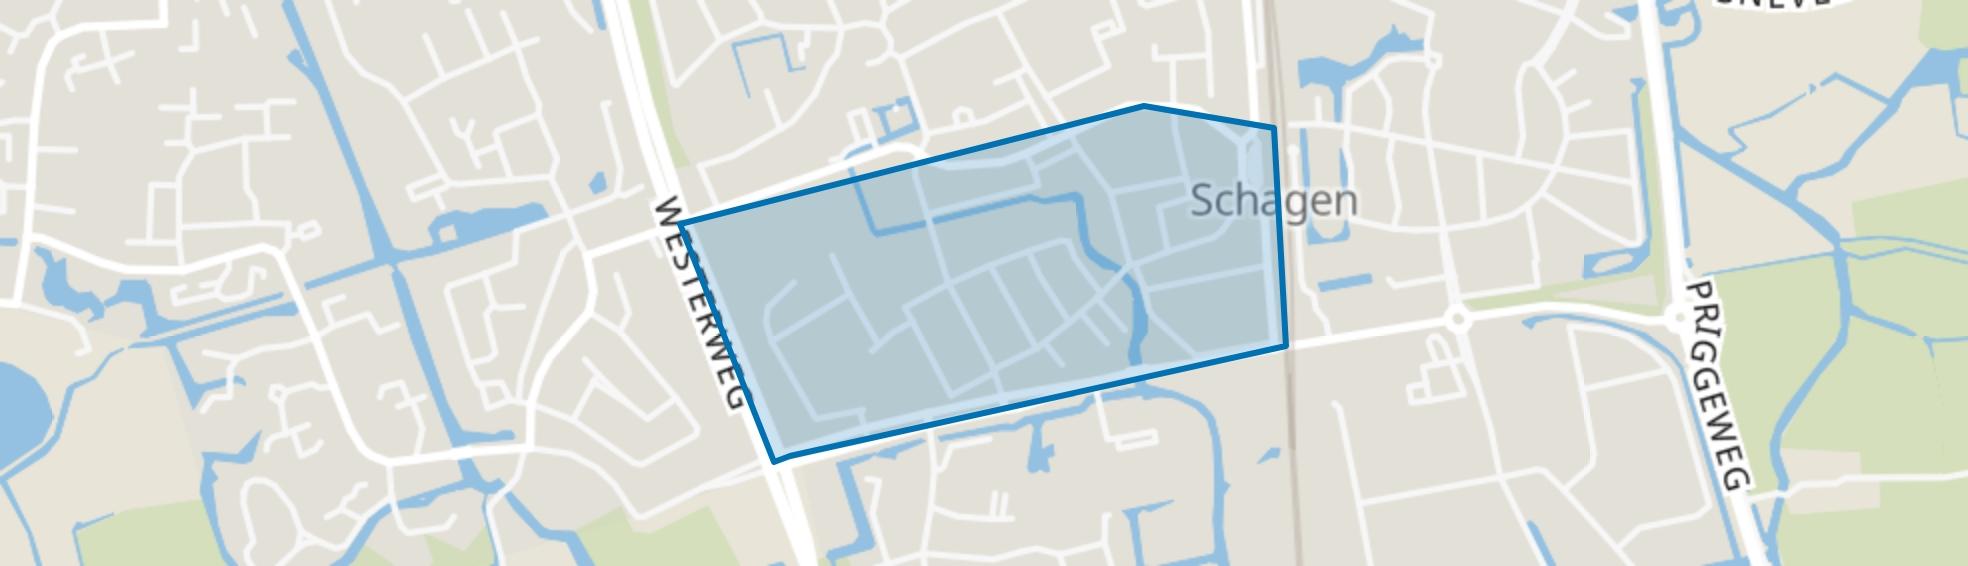 Schagen-Centrum-Zuid, Schagen map